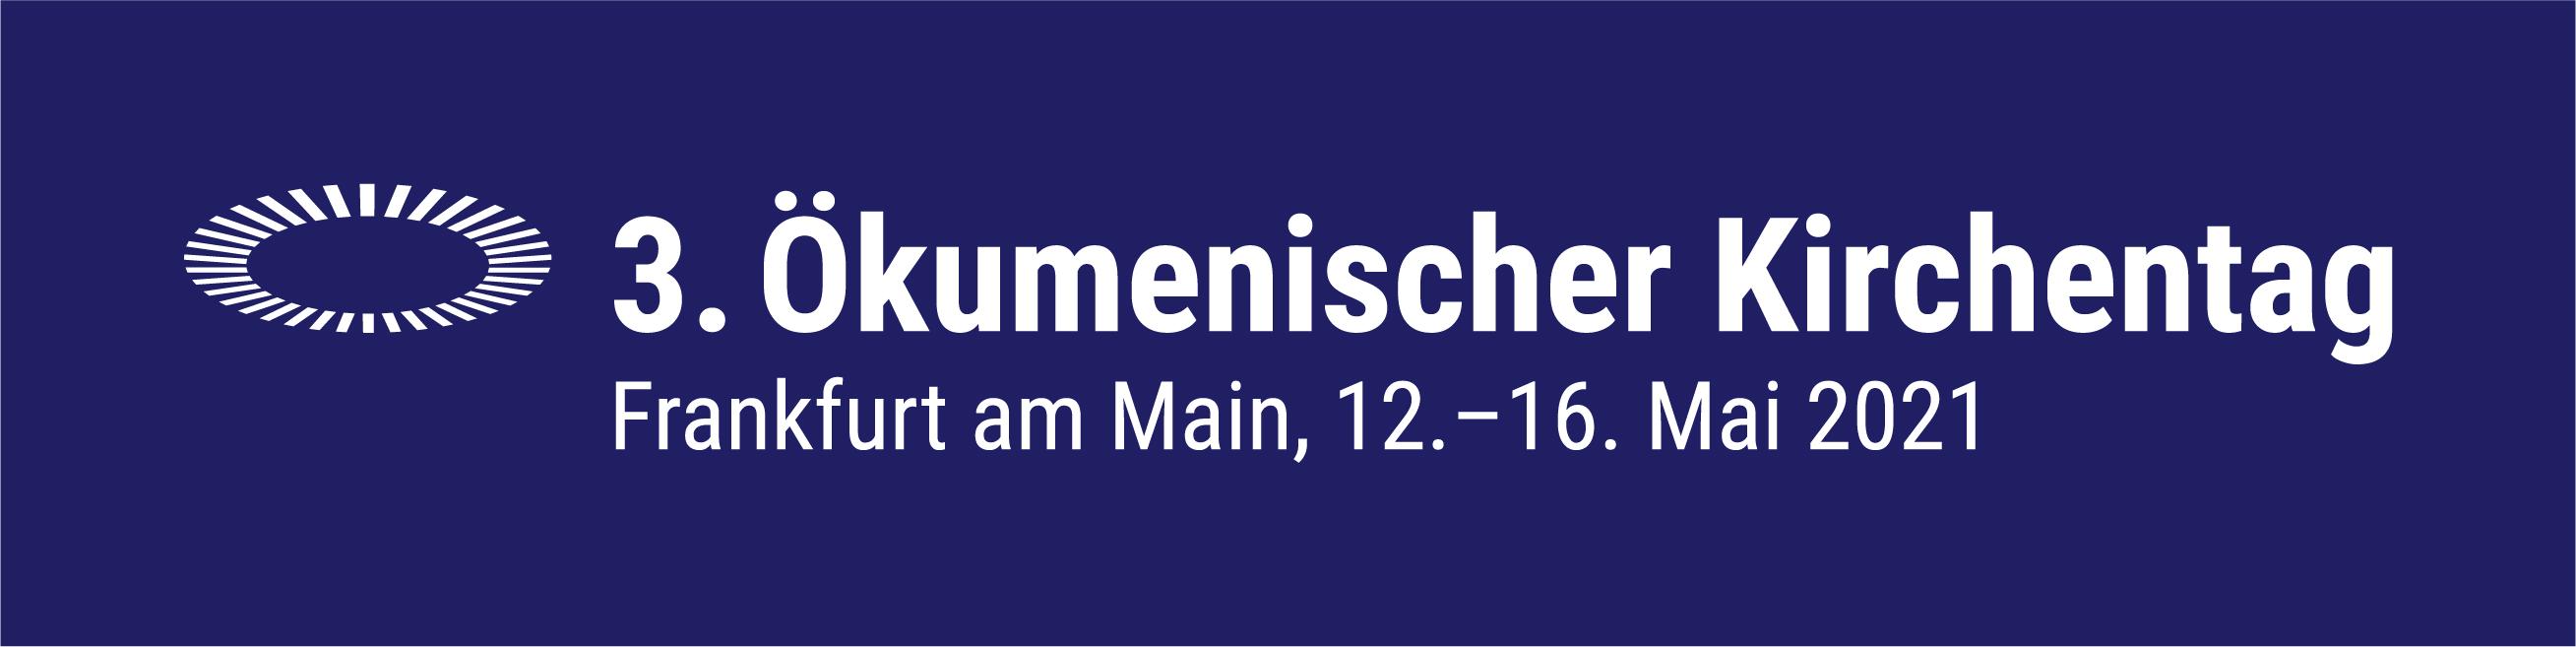 3. Ökumenischer Kirchentag Frankfurt 2021 e. V.